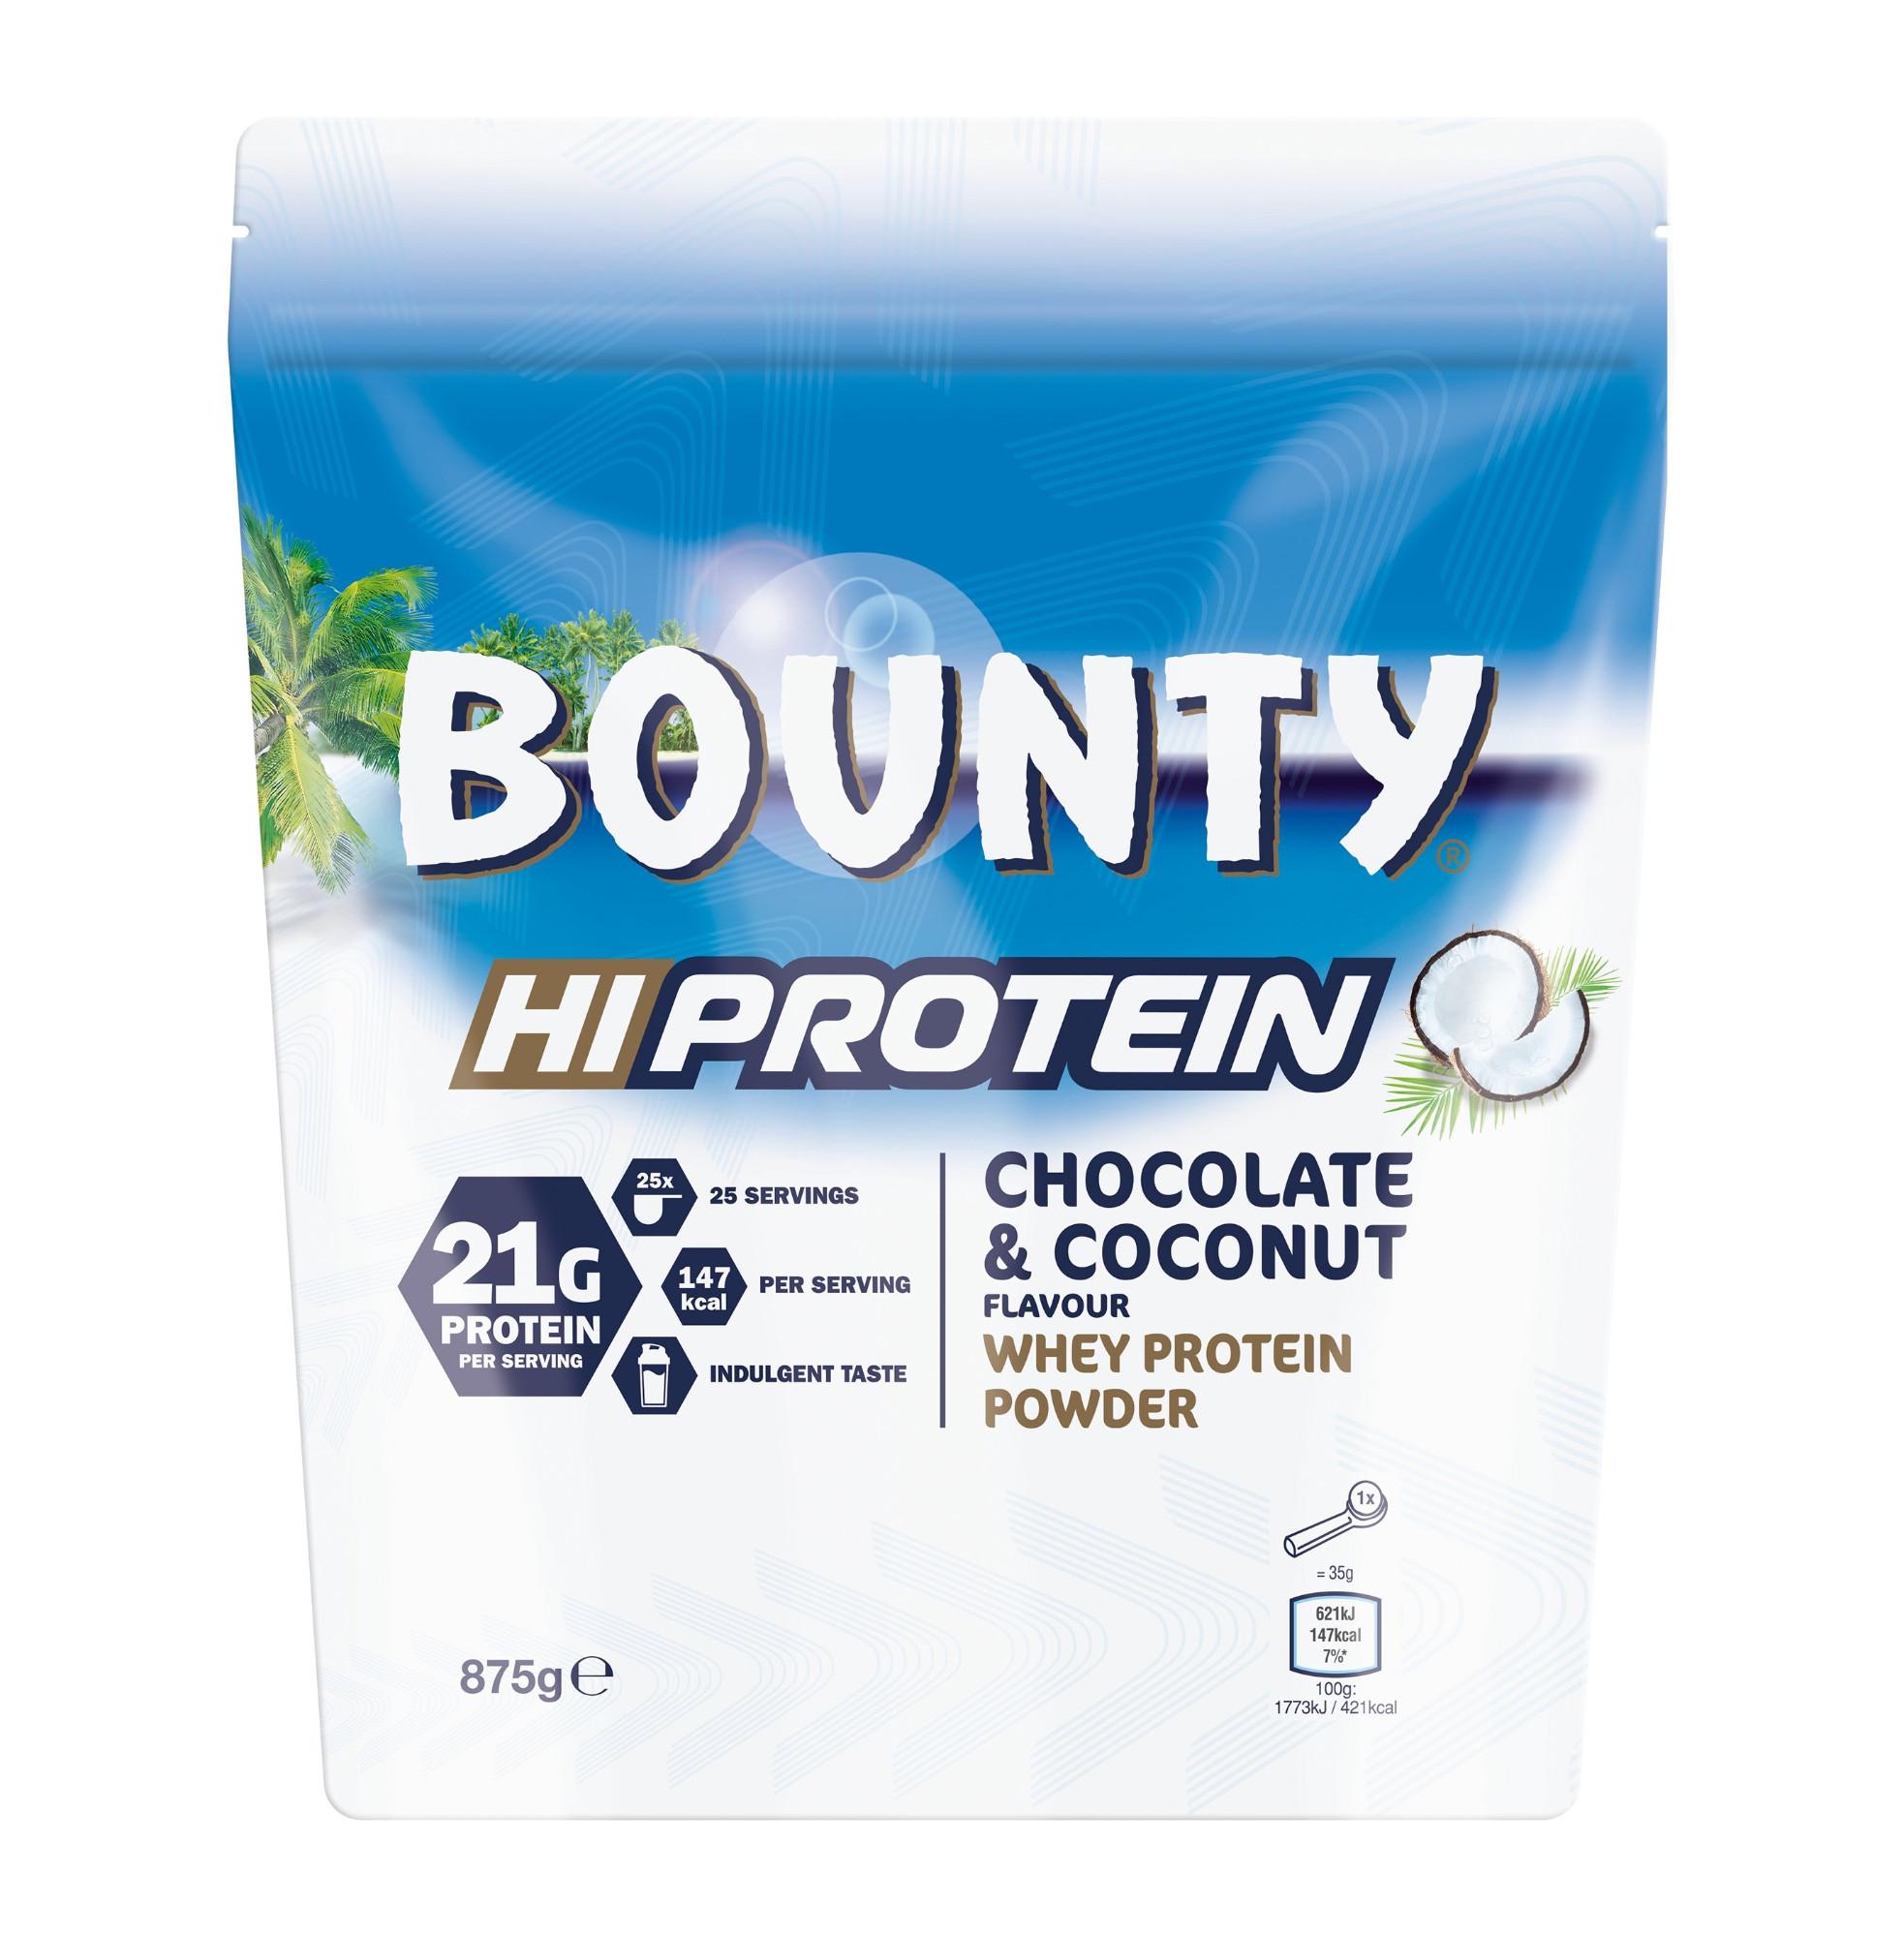 Mars Bounty Hi Protein